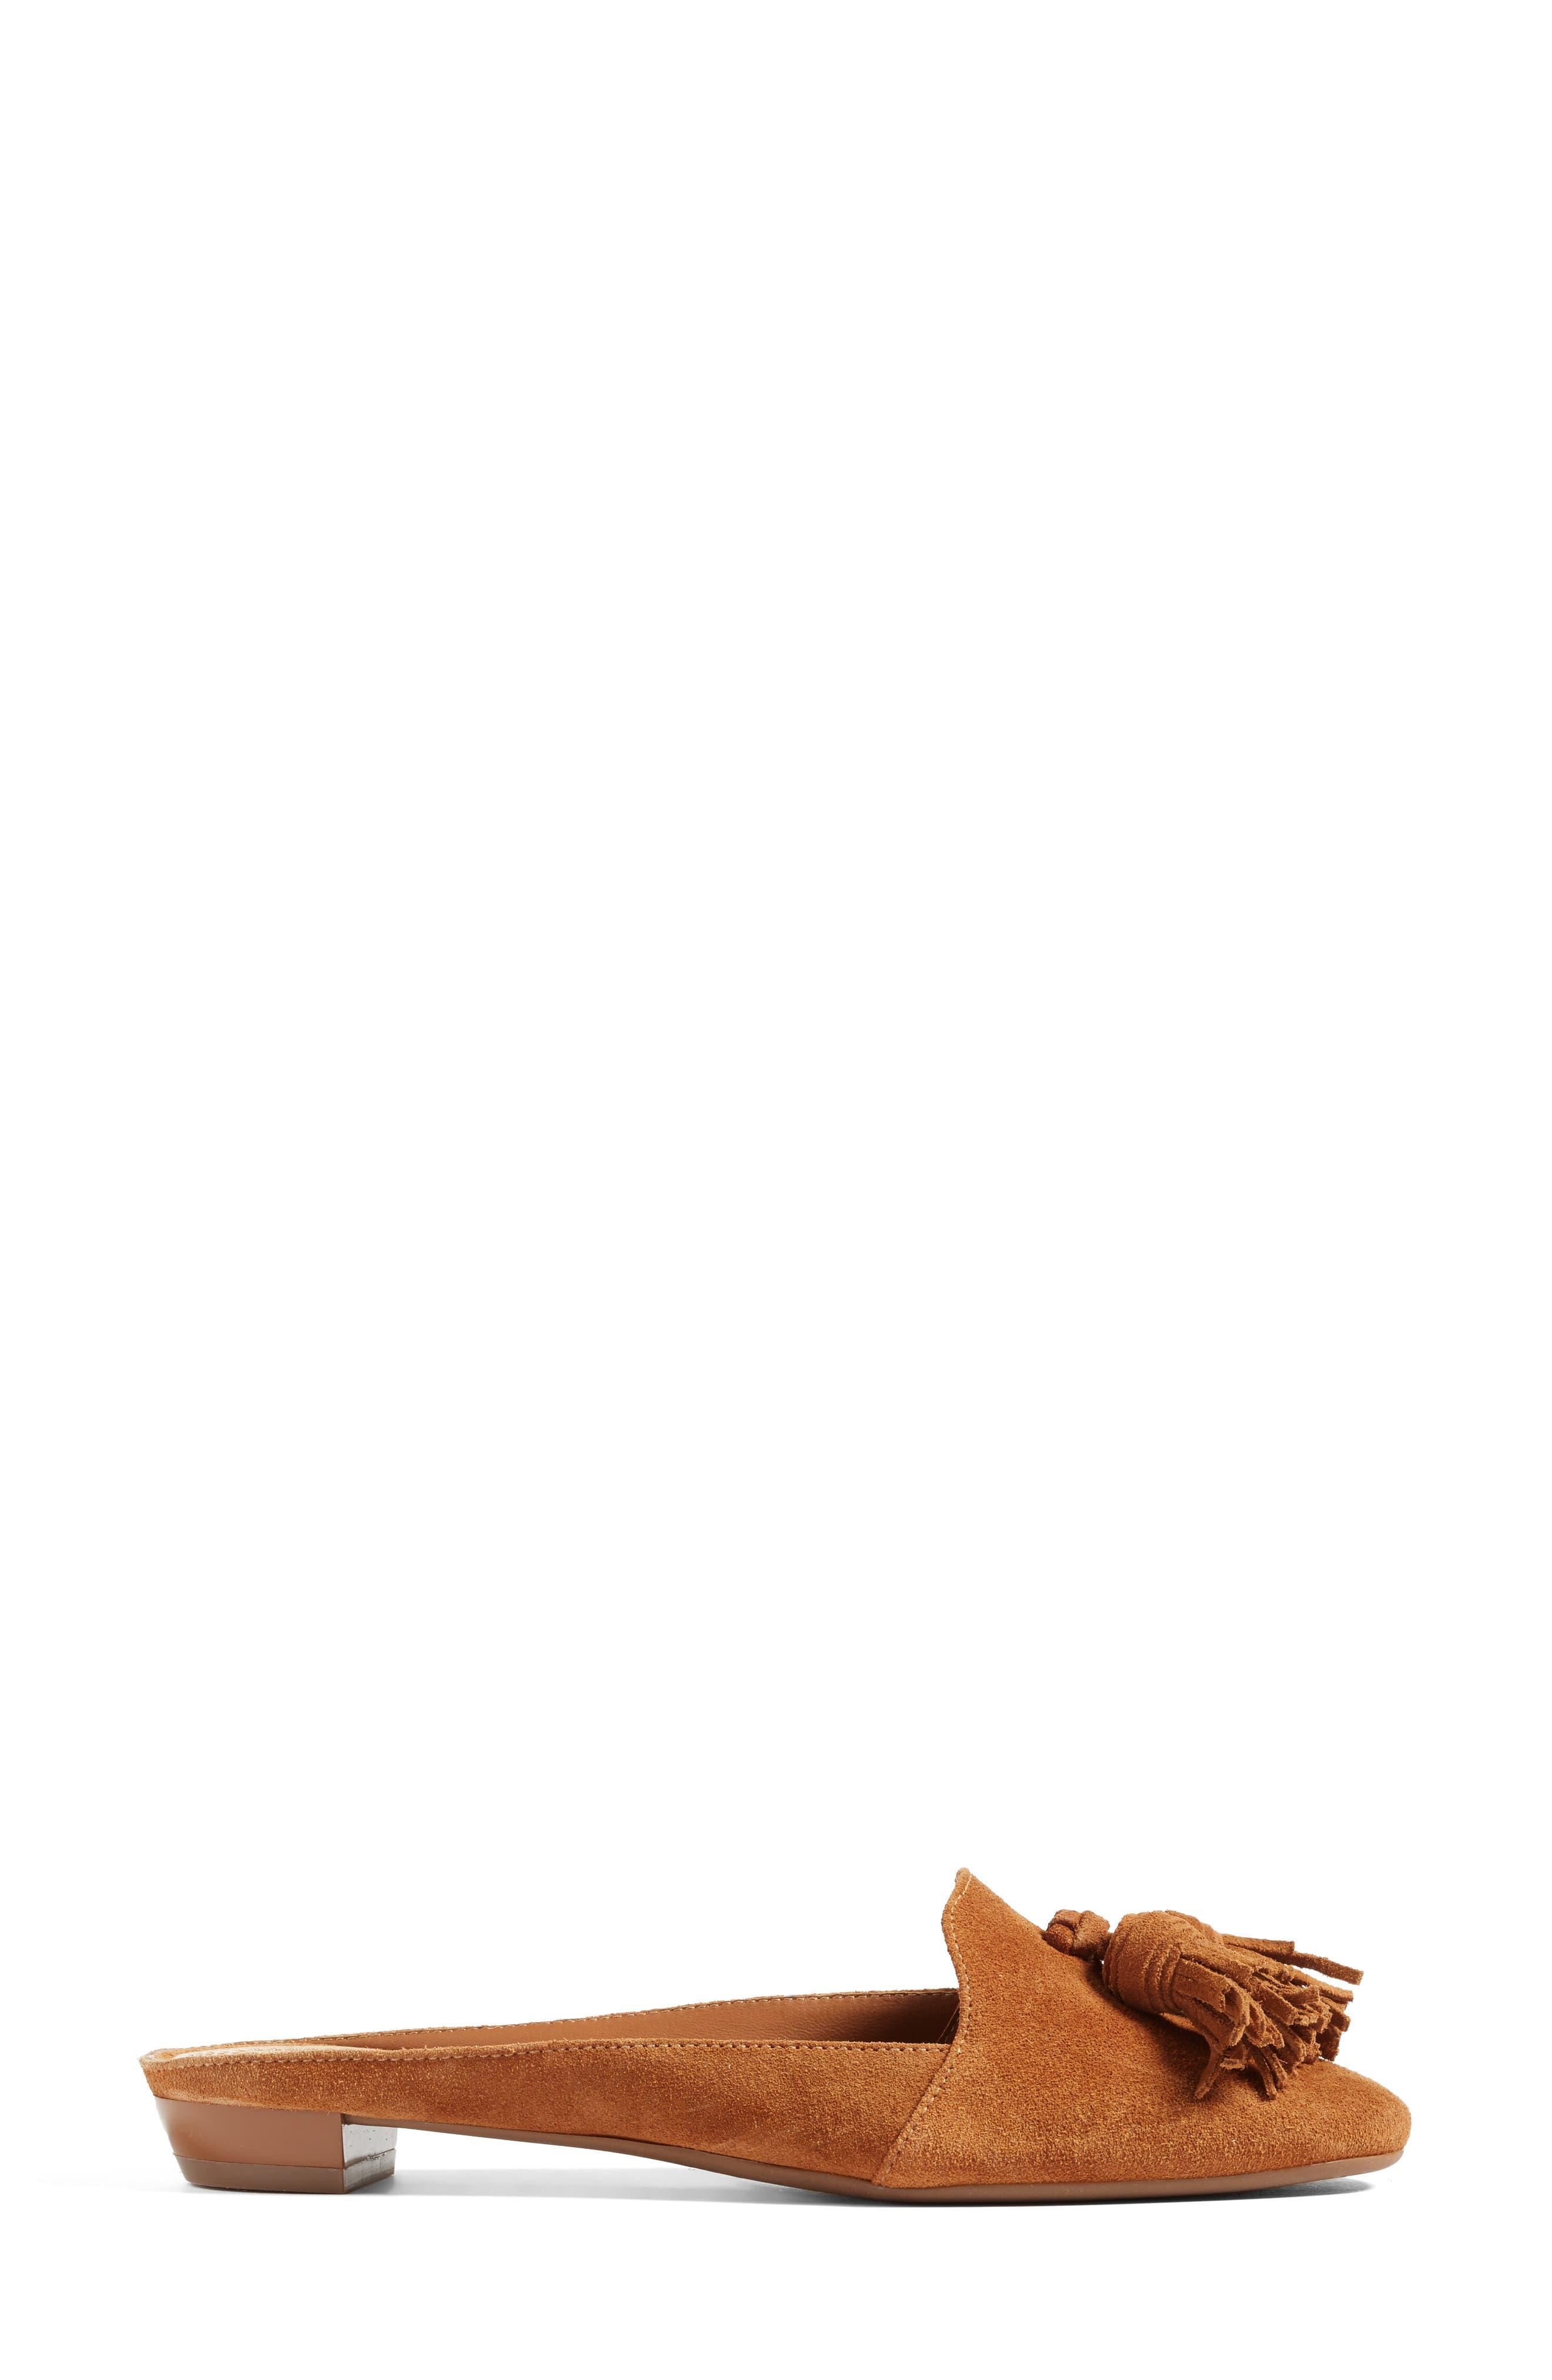 TORY BURCH, Salinas Tassel Loafer Mule, Alternate thumbnail 2, color, 250